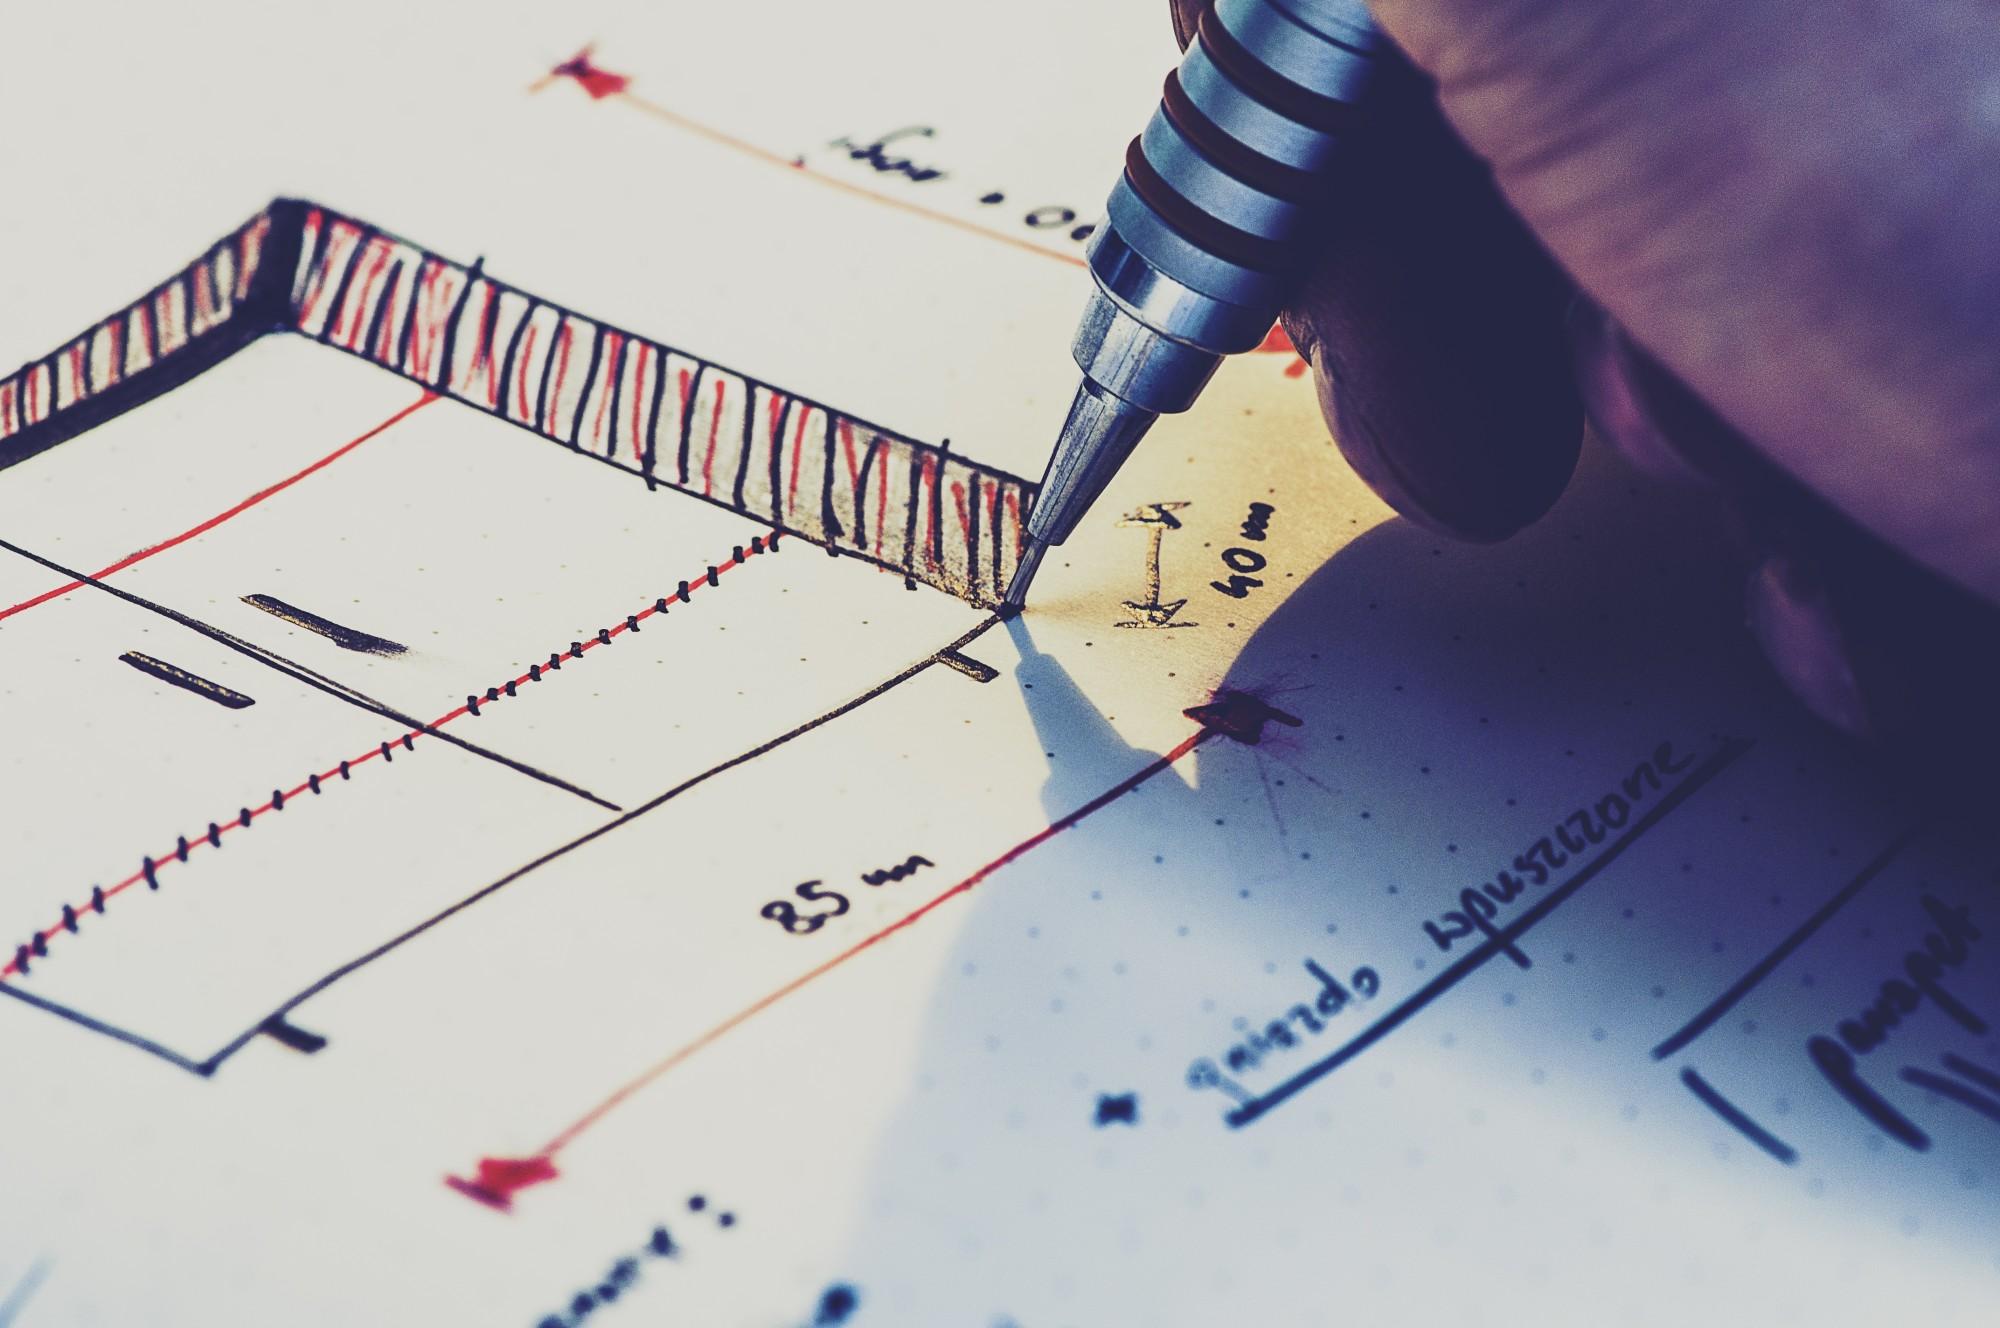 person designing something on paper